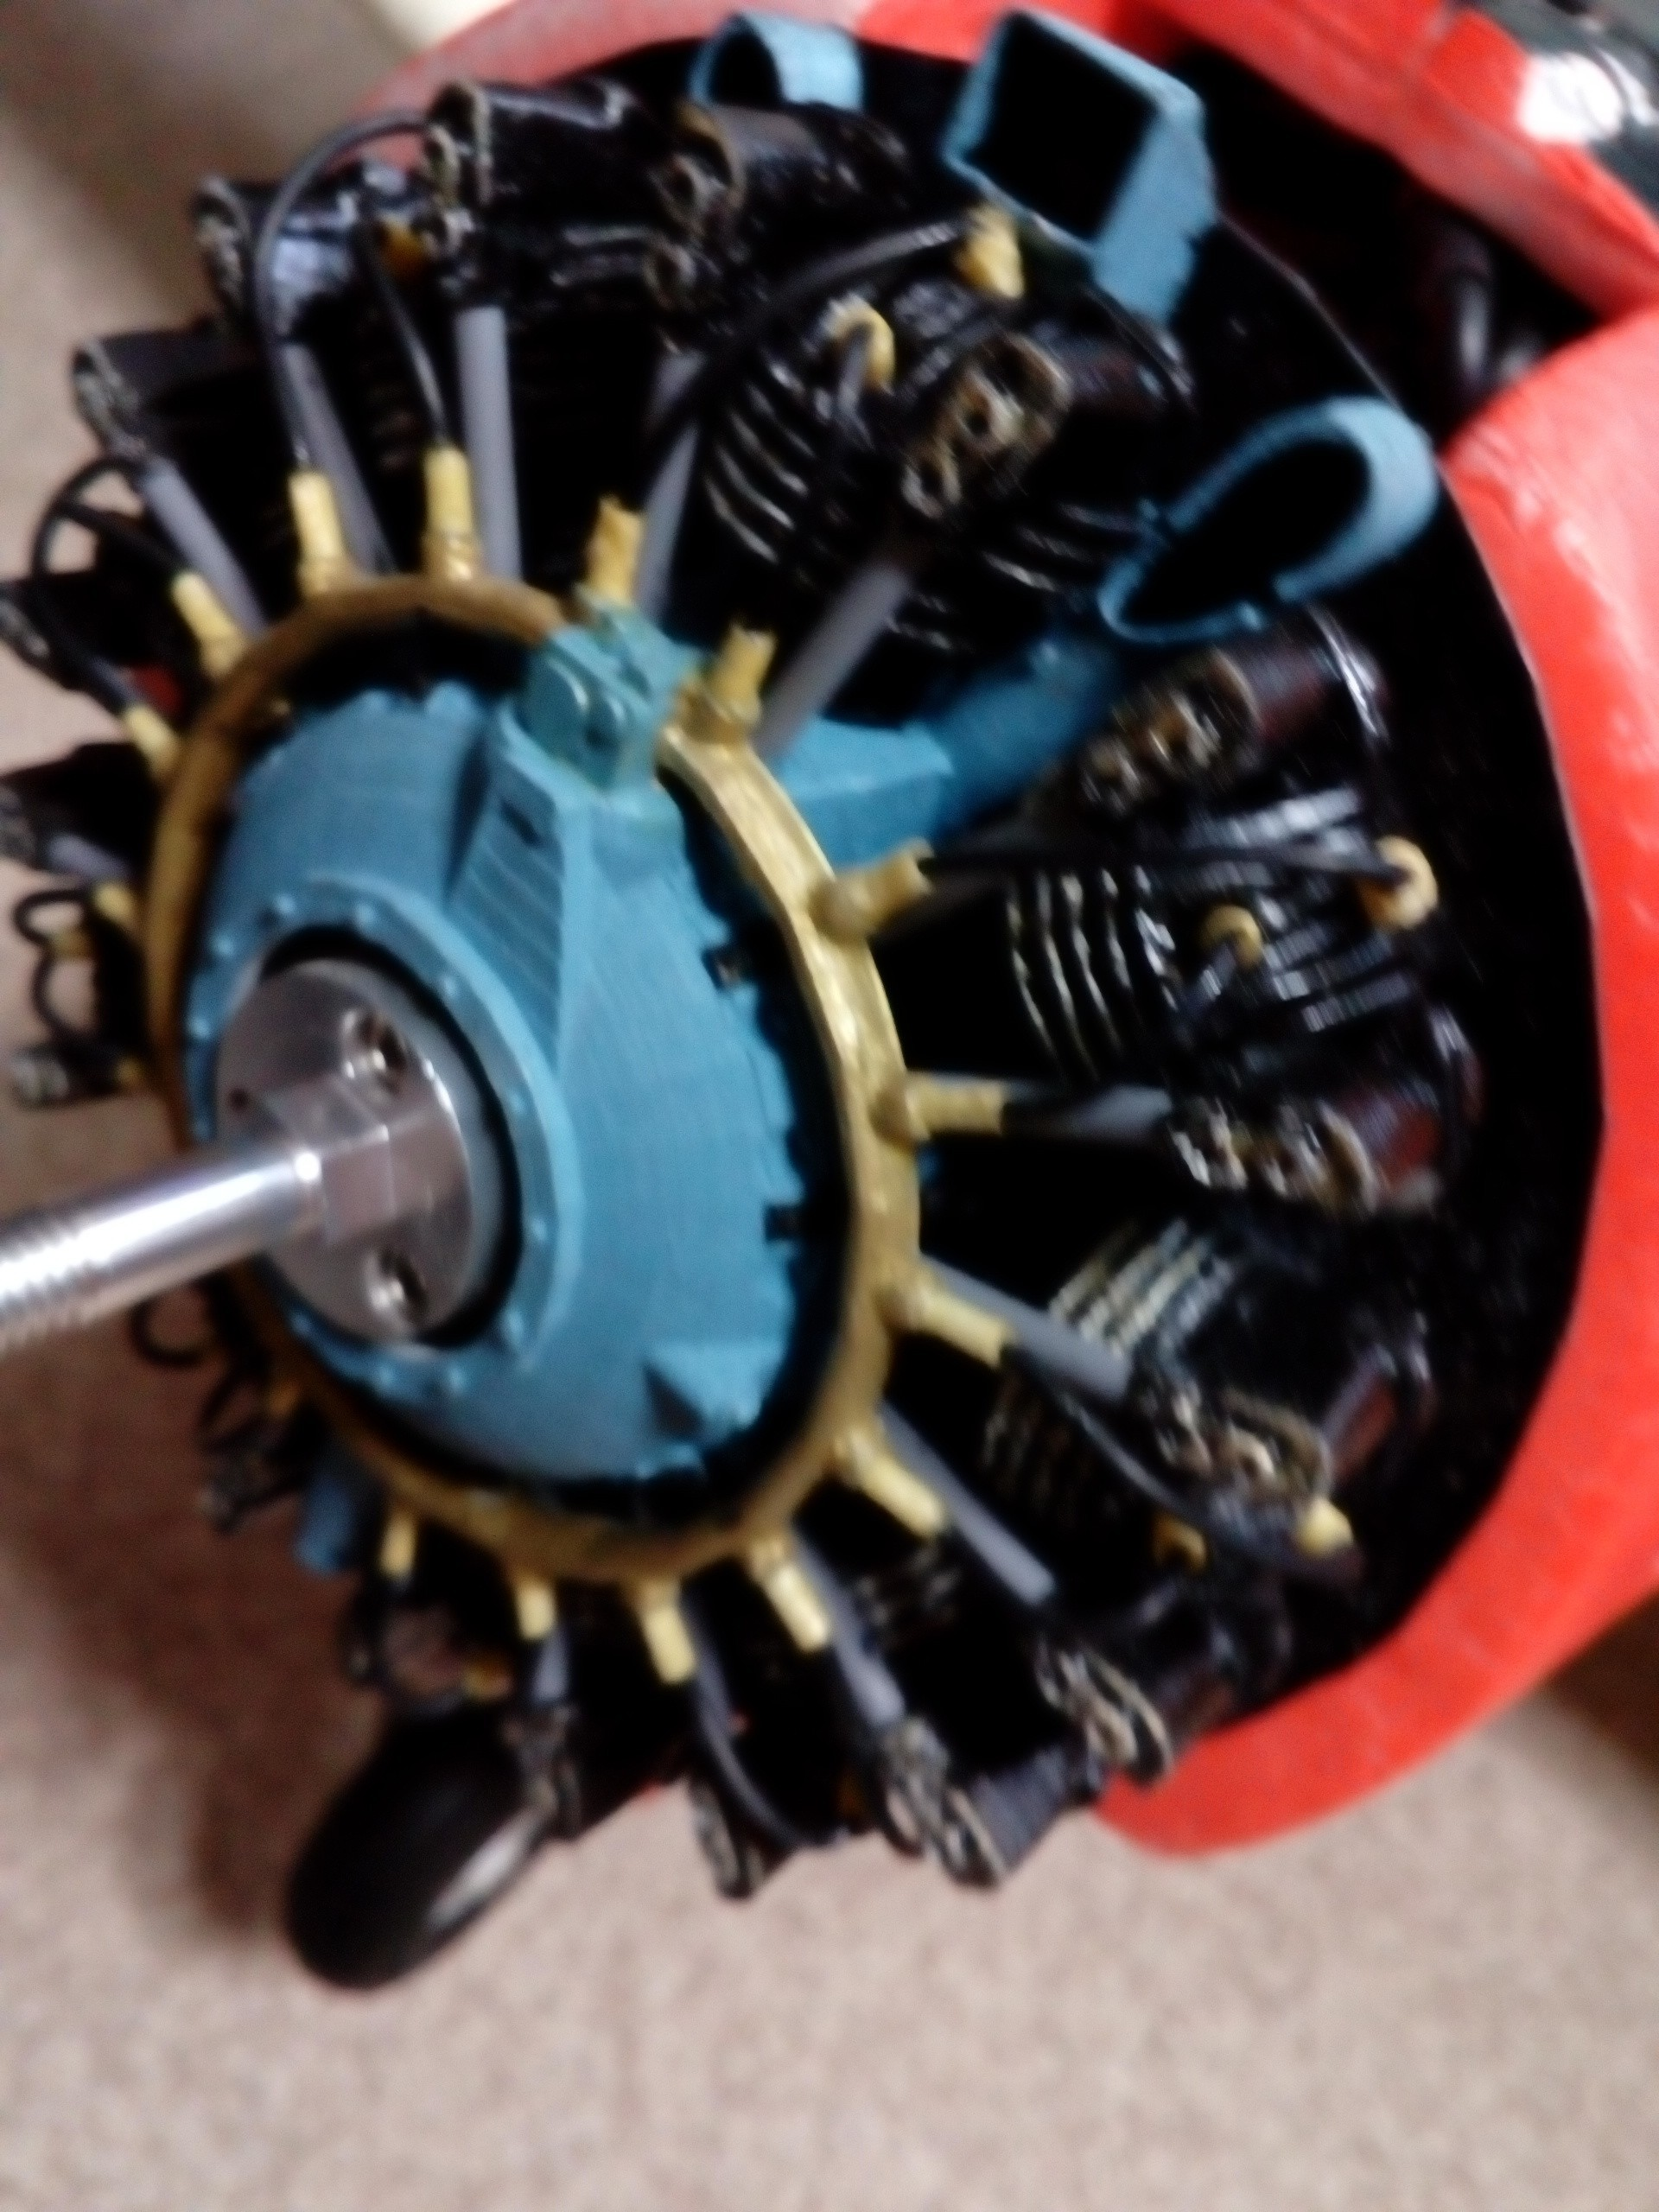 IMG_20170620_153850.jpg Download STL file DUMMY RADIAL ENGINE • 3D printing design, zzizitop